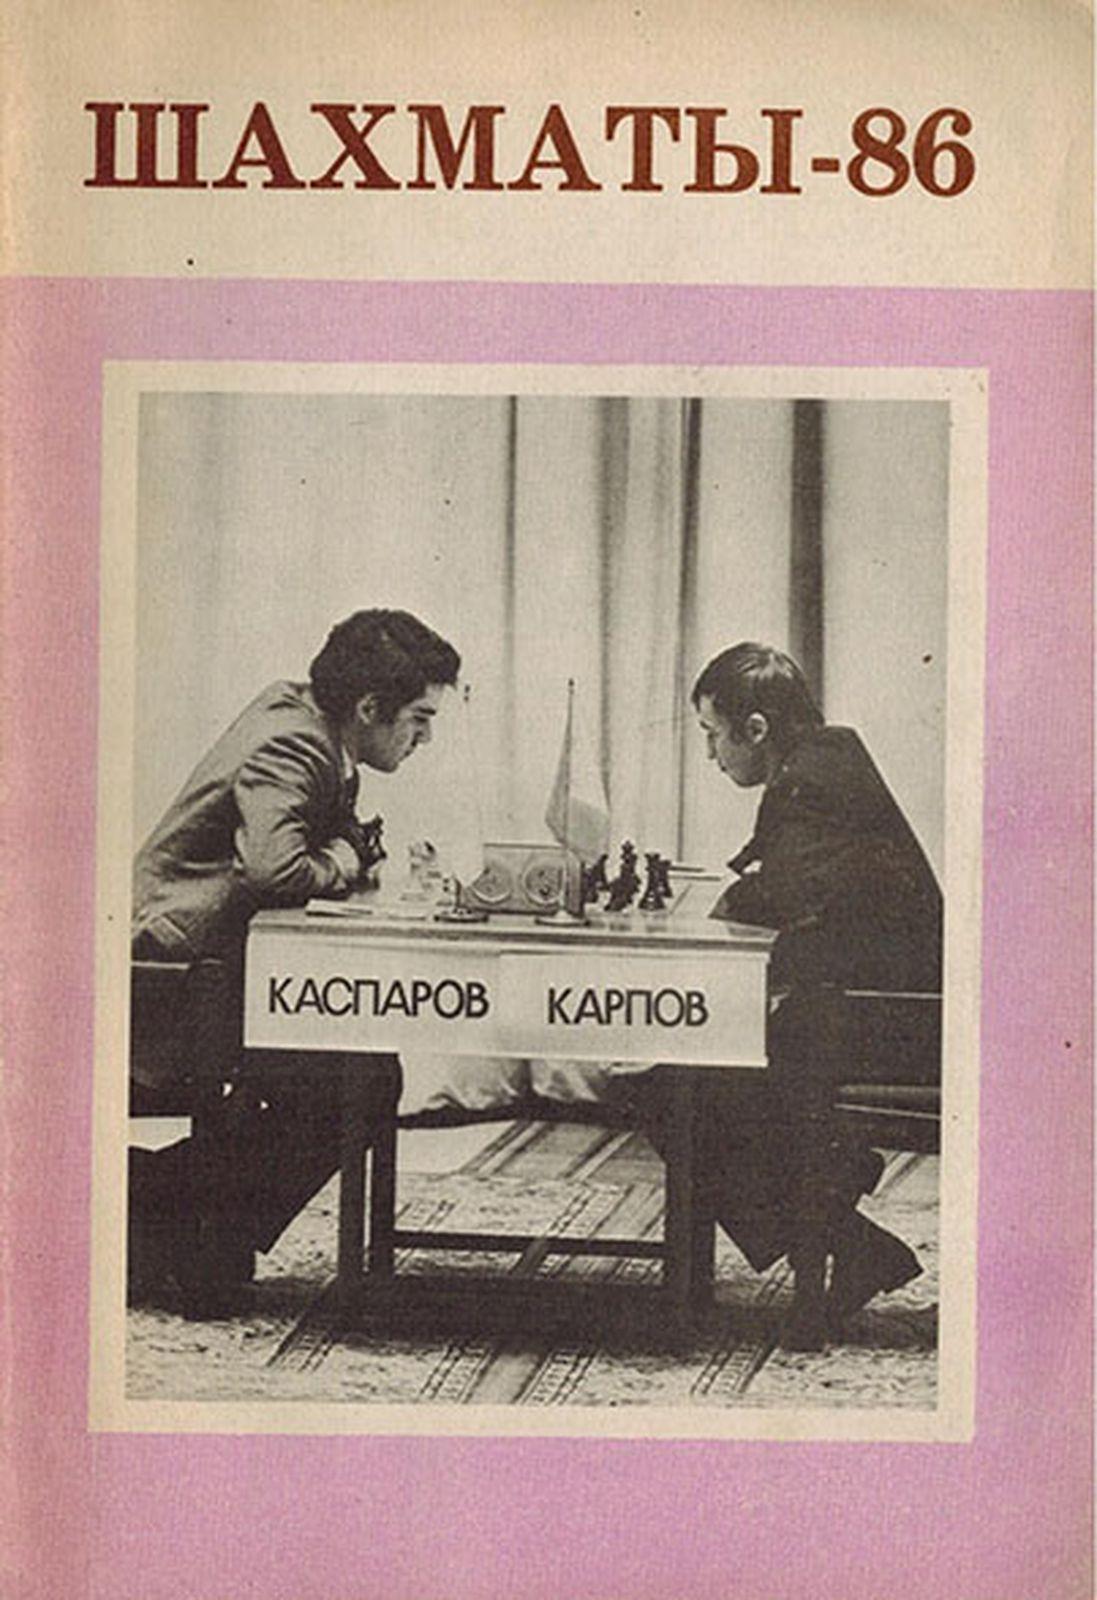 Шахматы - 86. Справочник любителя шахмат календарь 1986